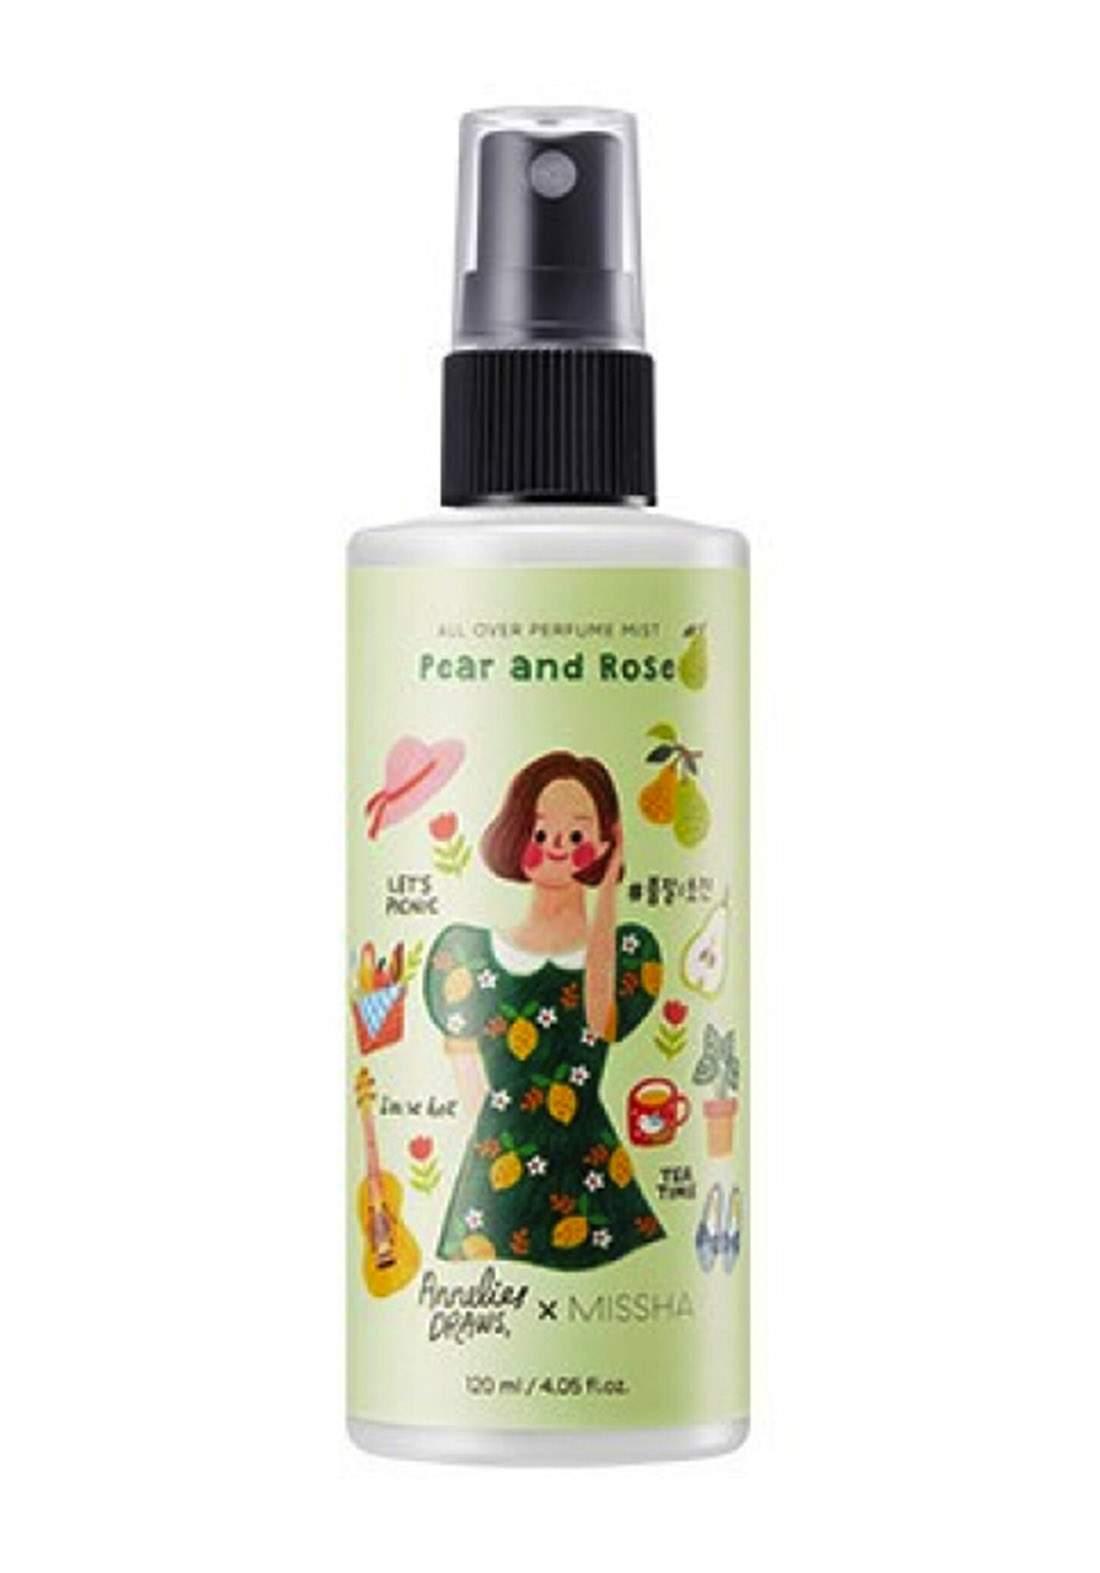 Missha Refreshing Body Mist Pear And Rose 120ml سبلاش للجسم